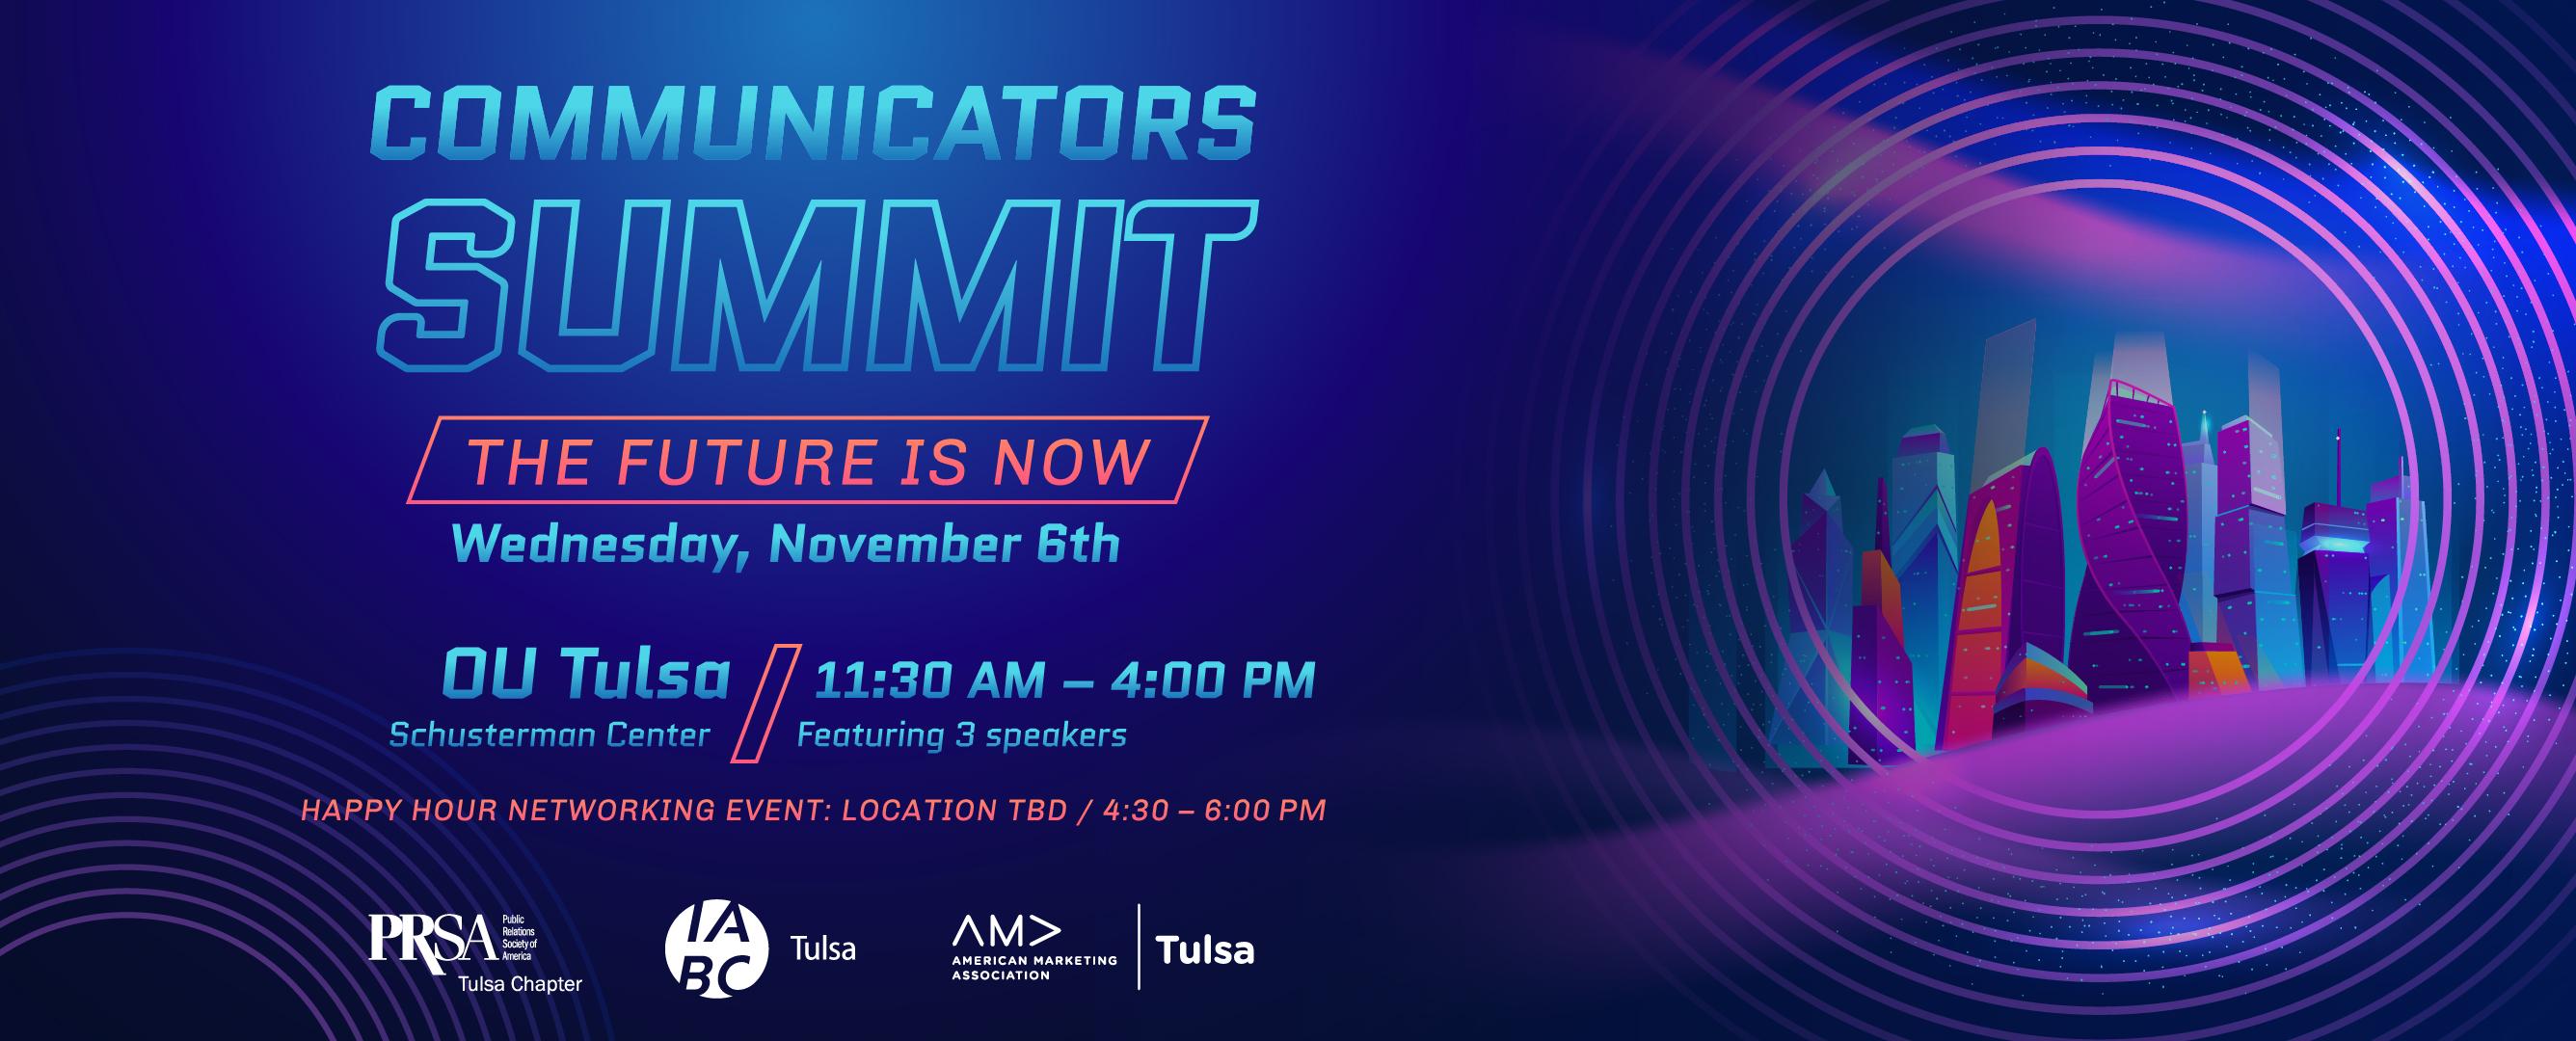 2019 Communicators Summit